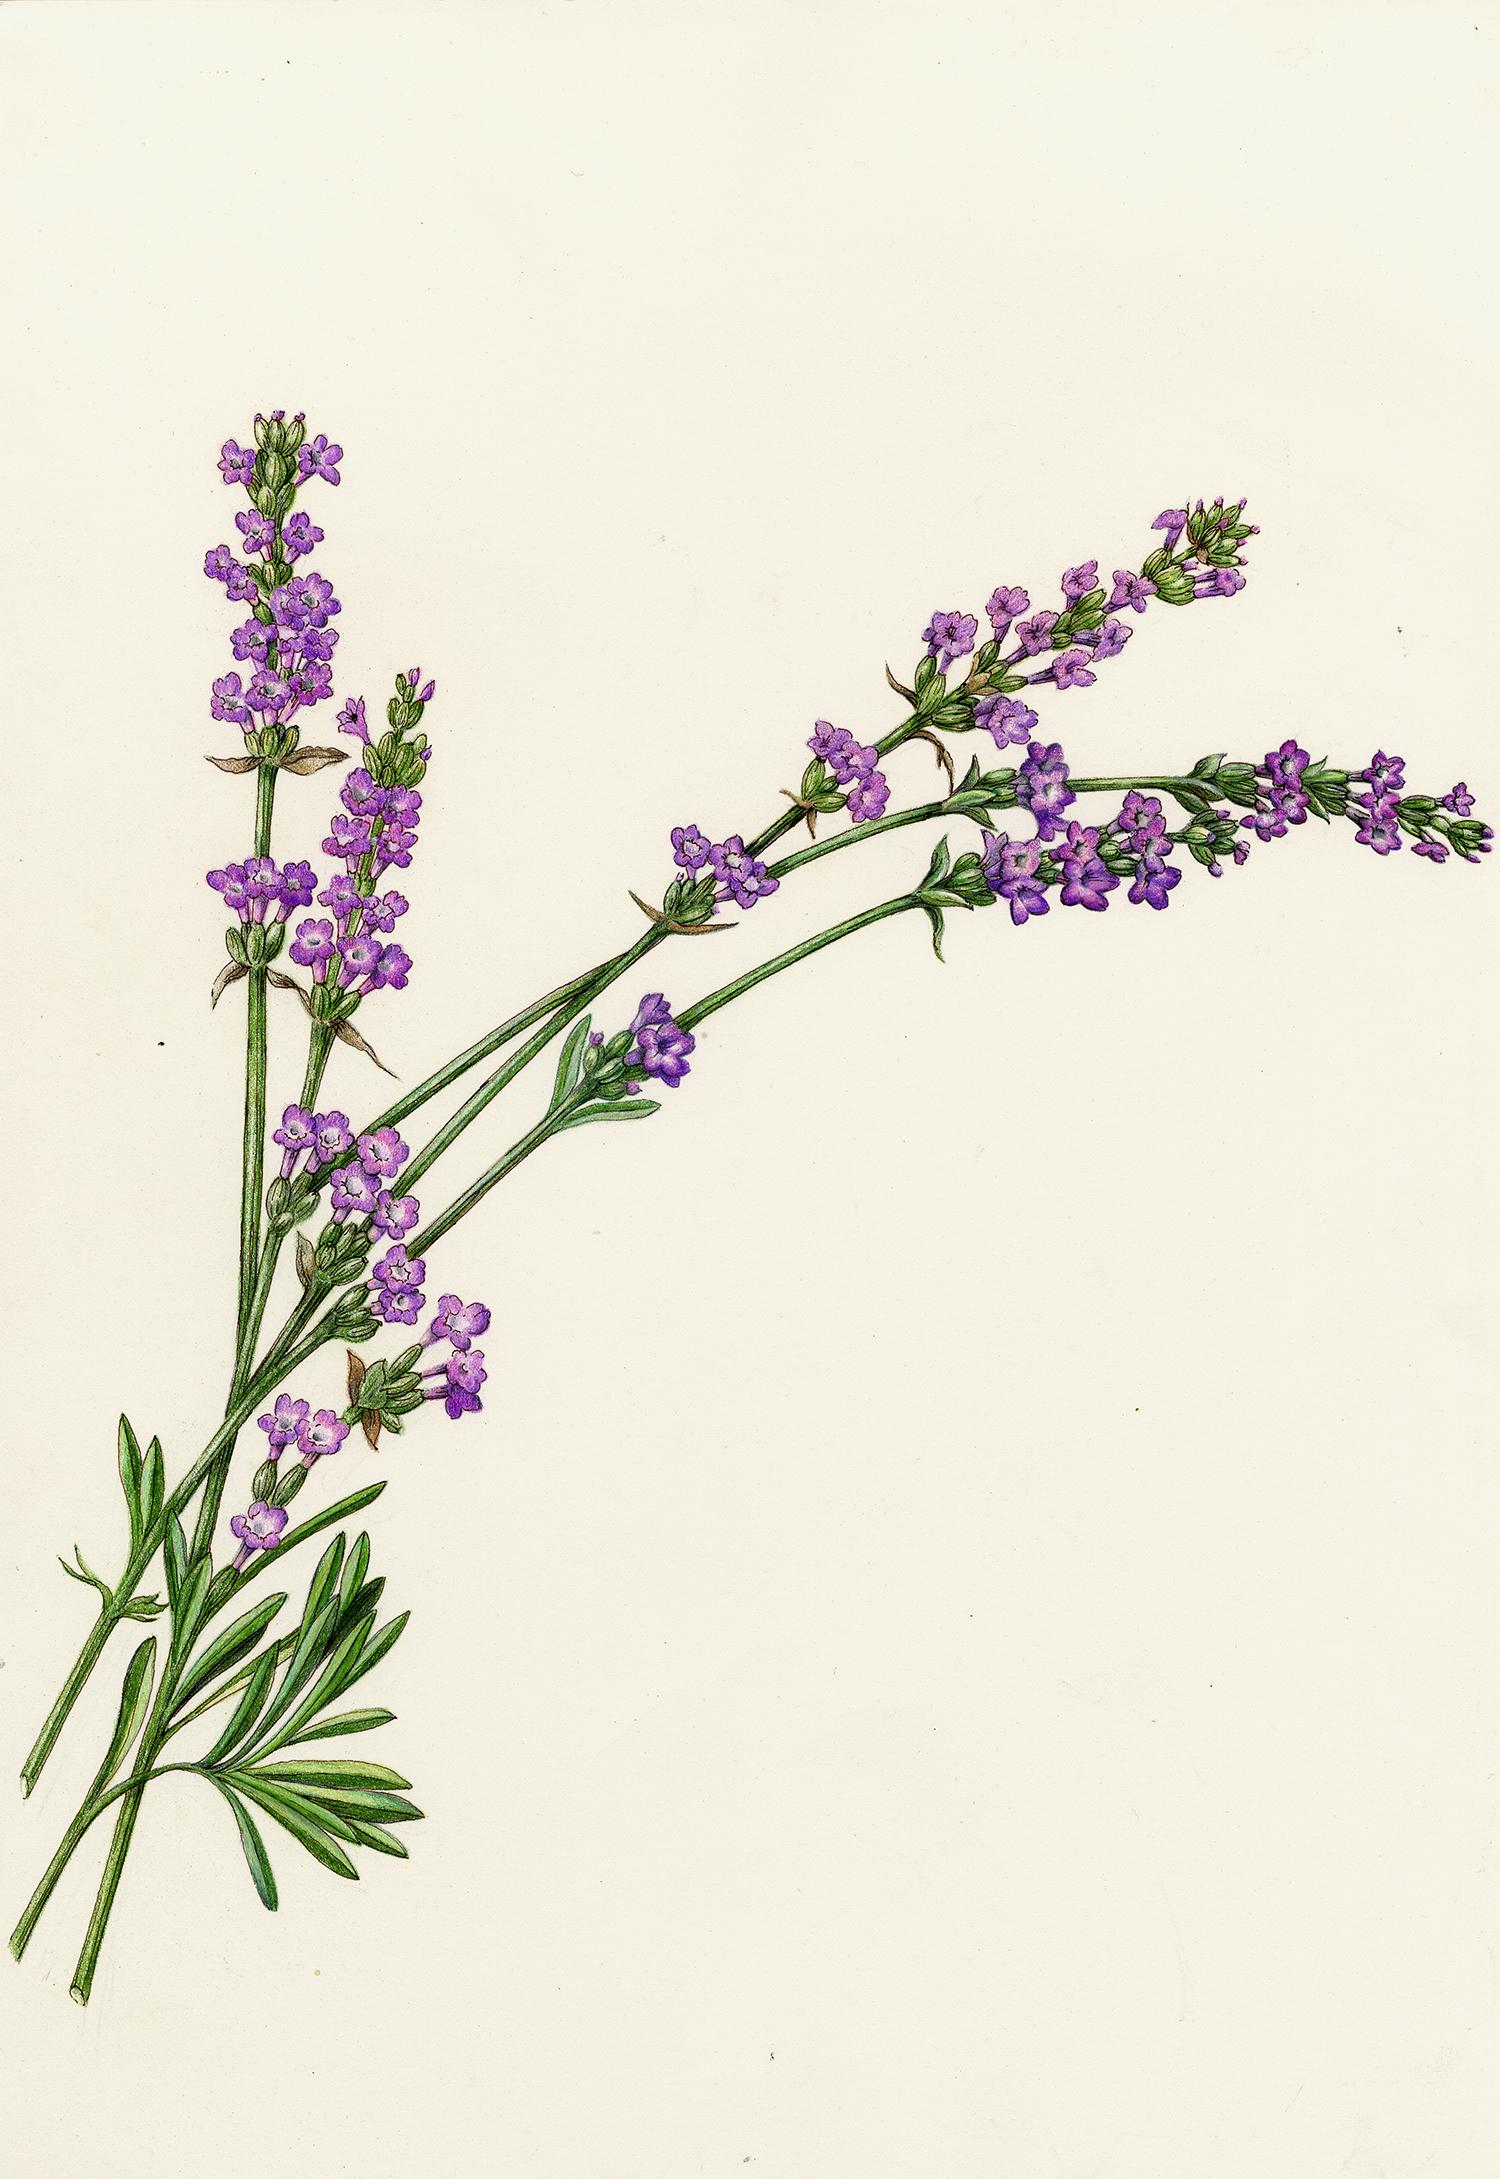 Lavender - Lavandula